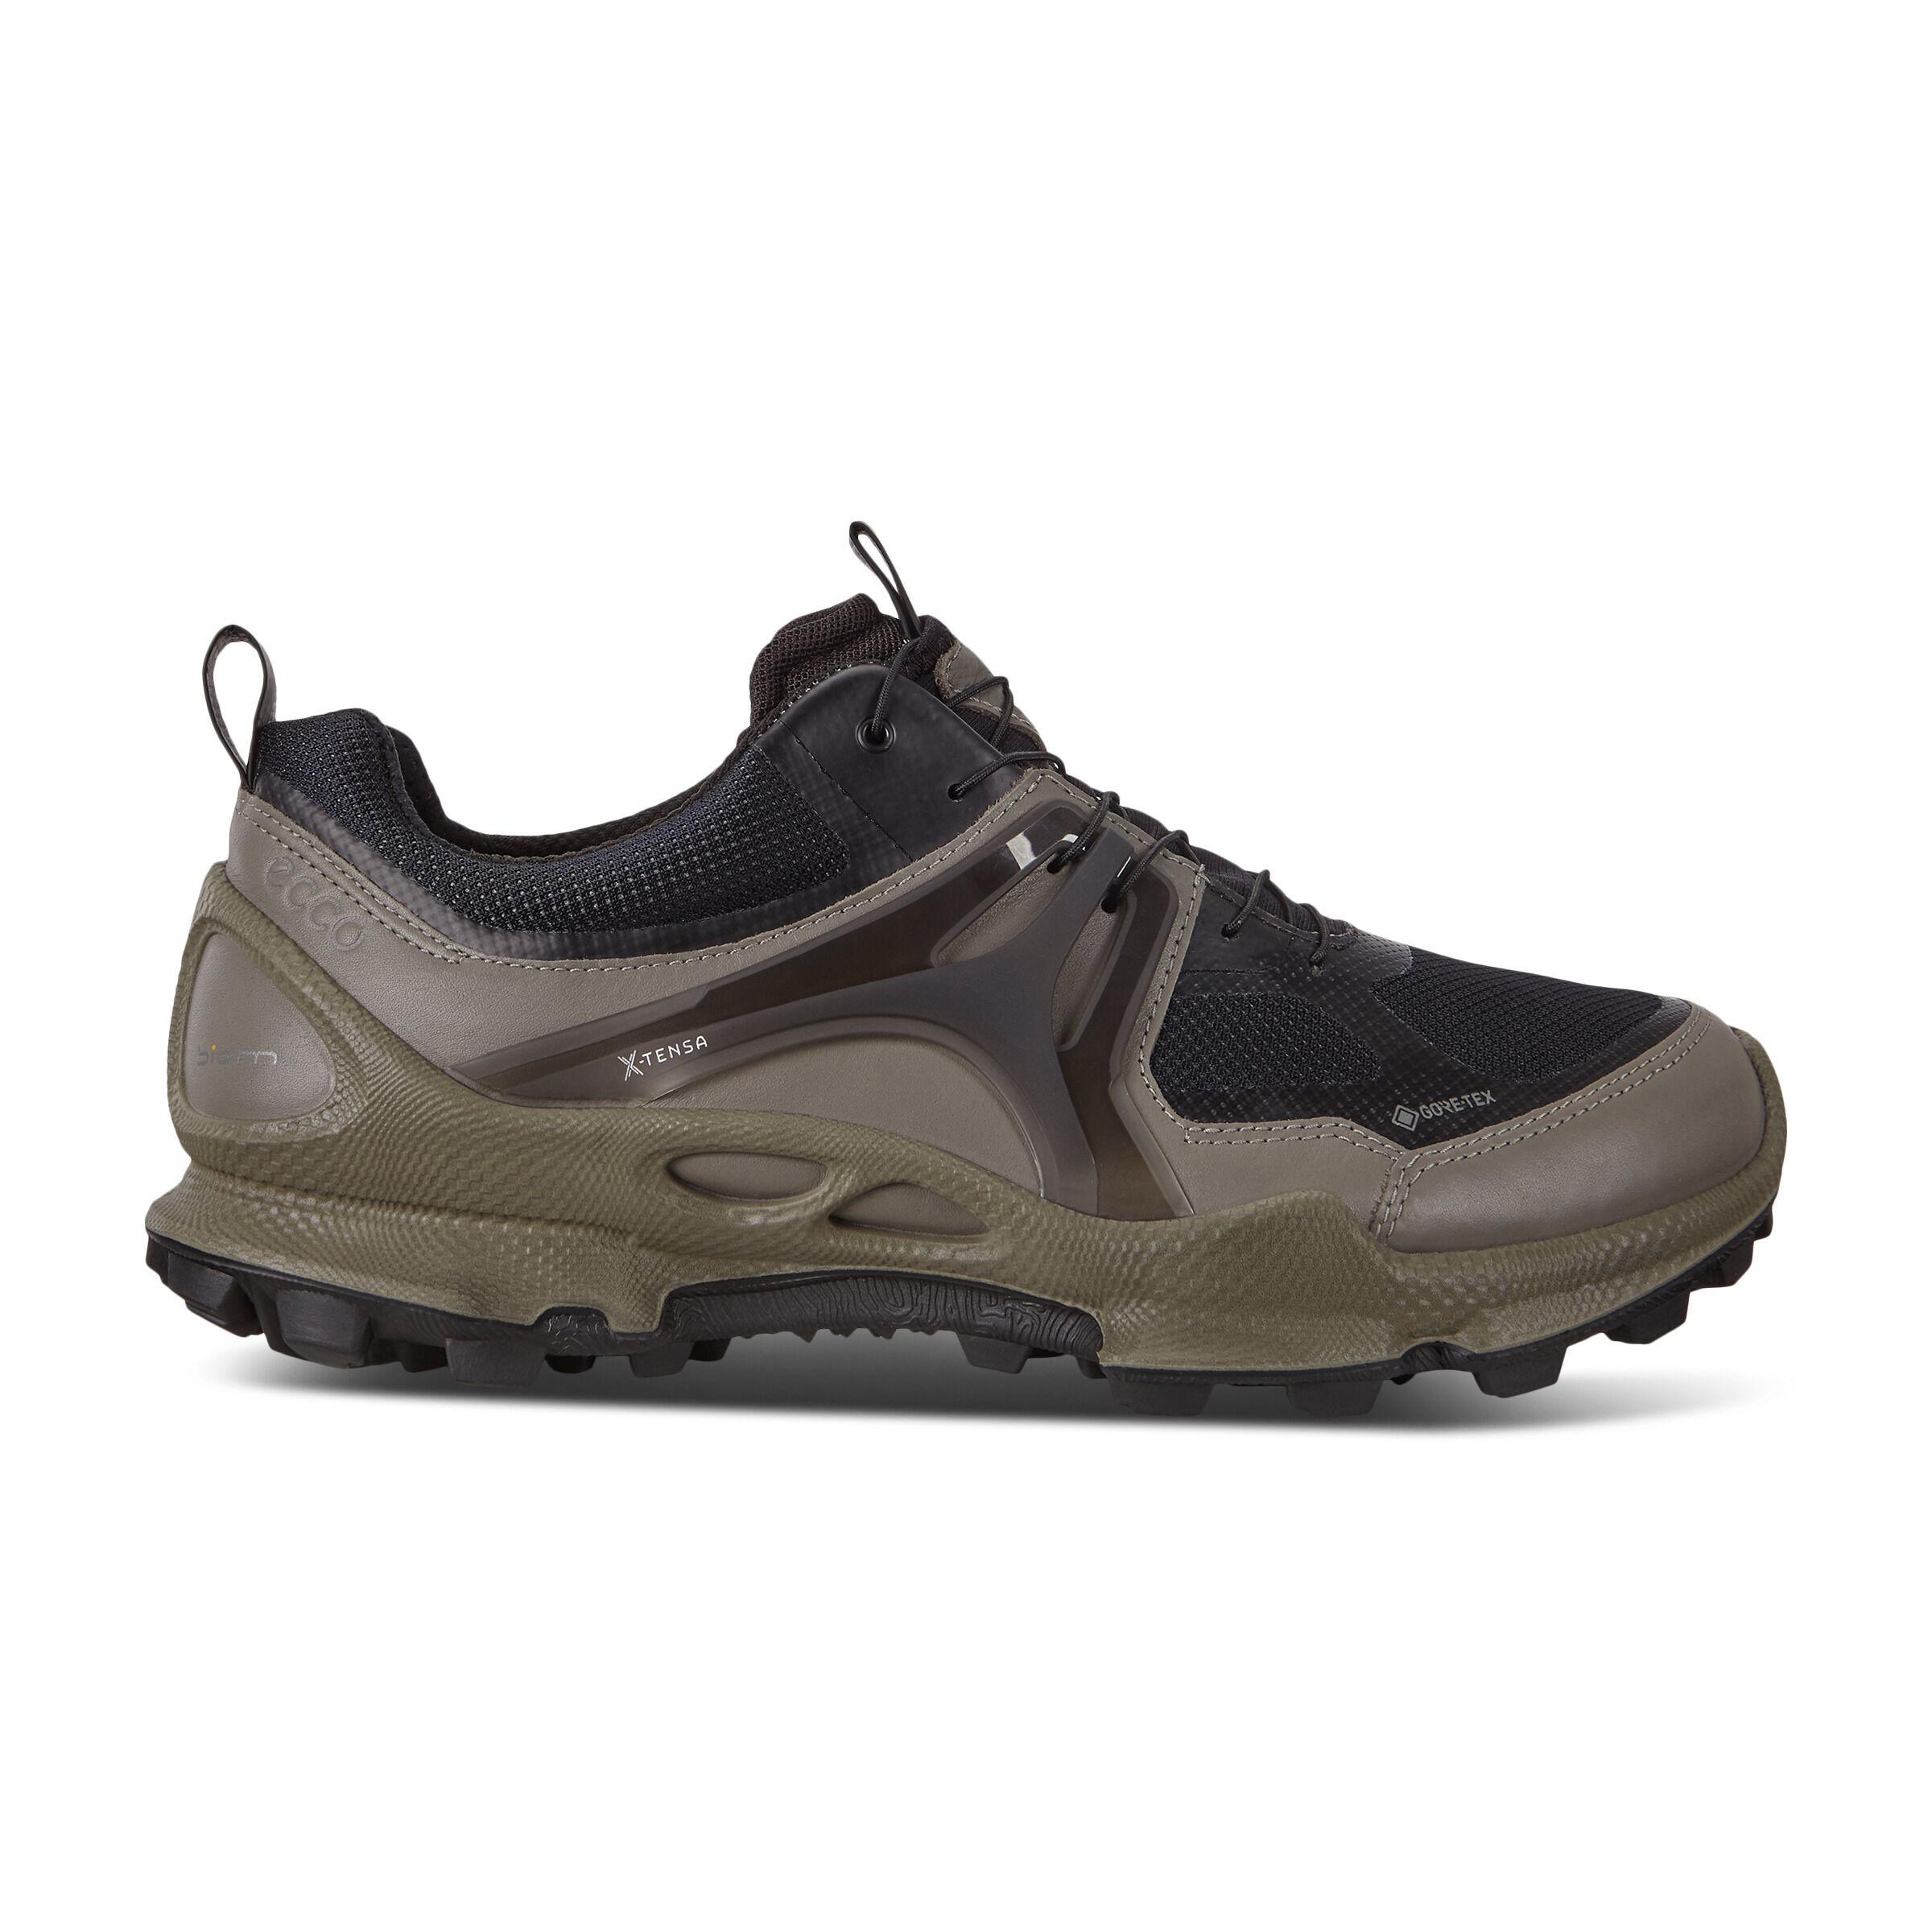 ECCO BIOM C-trail Mens Low GTX Shoes Sneakers Size 10/10.5 Warm Grey